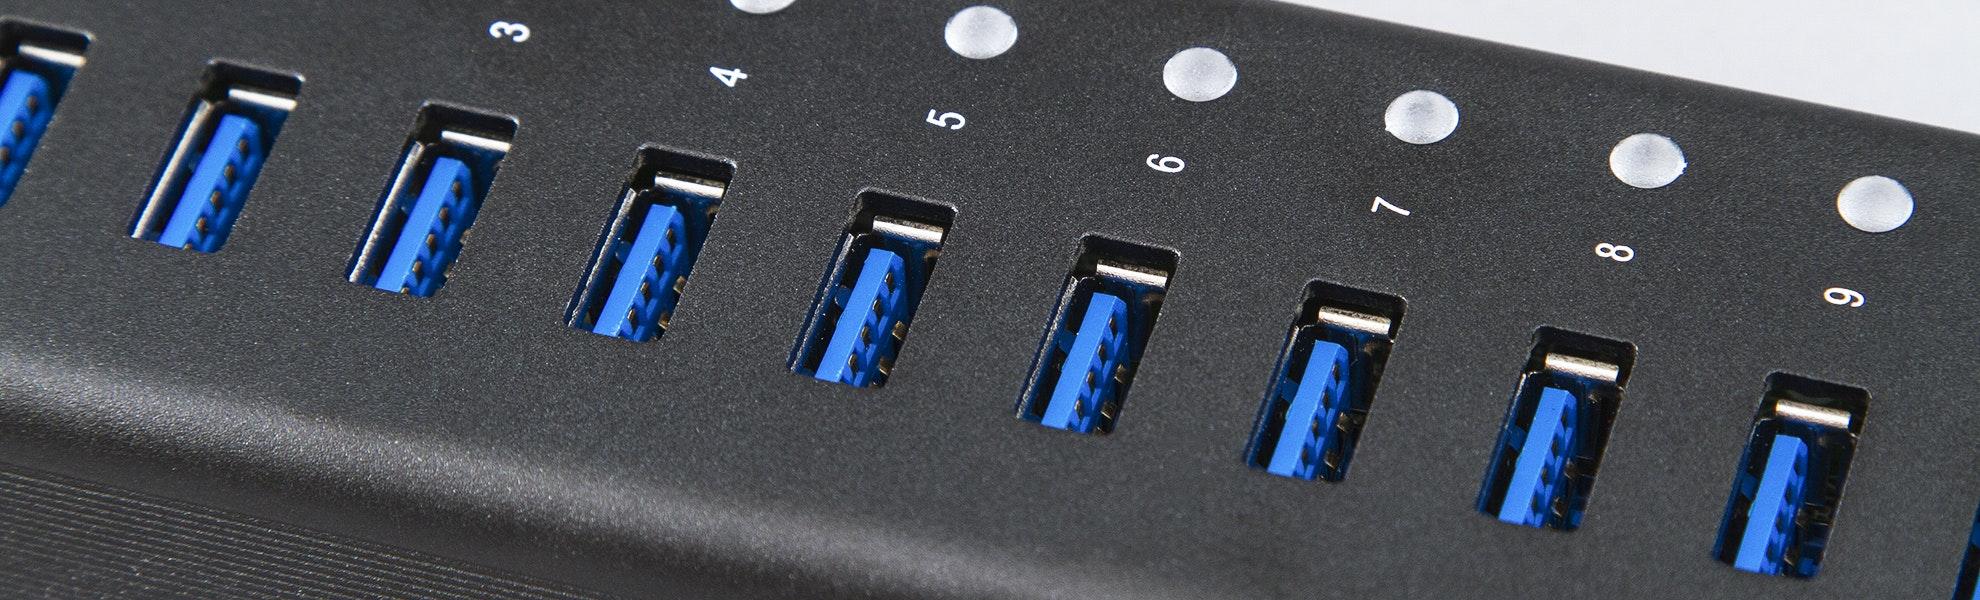 Juiced Systems USB 3.0 10-Port Hub